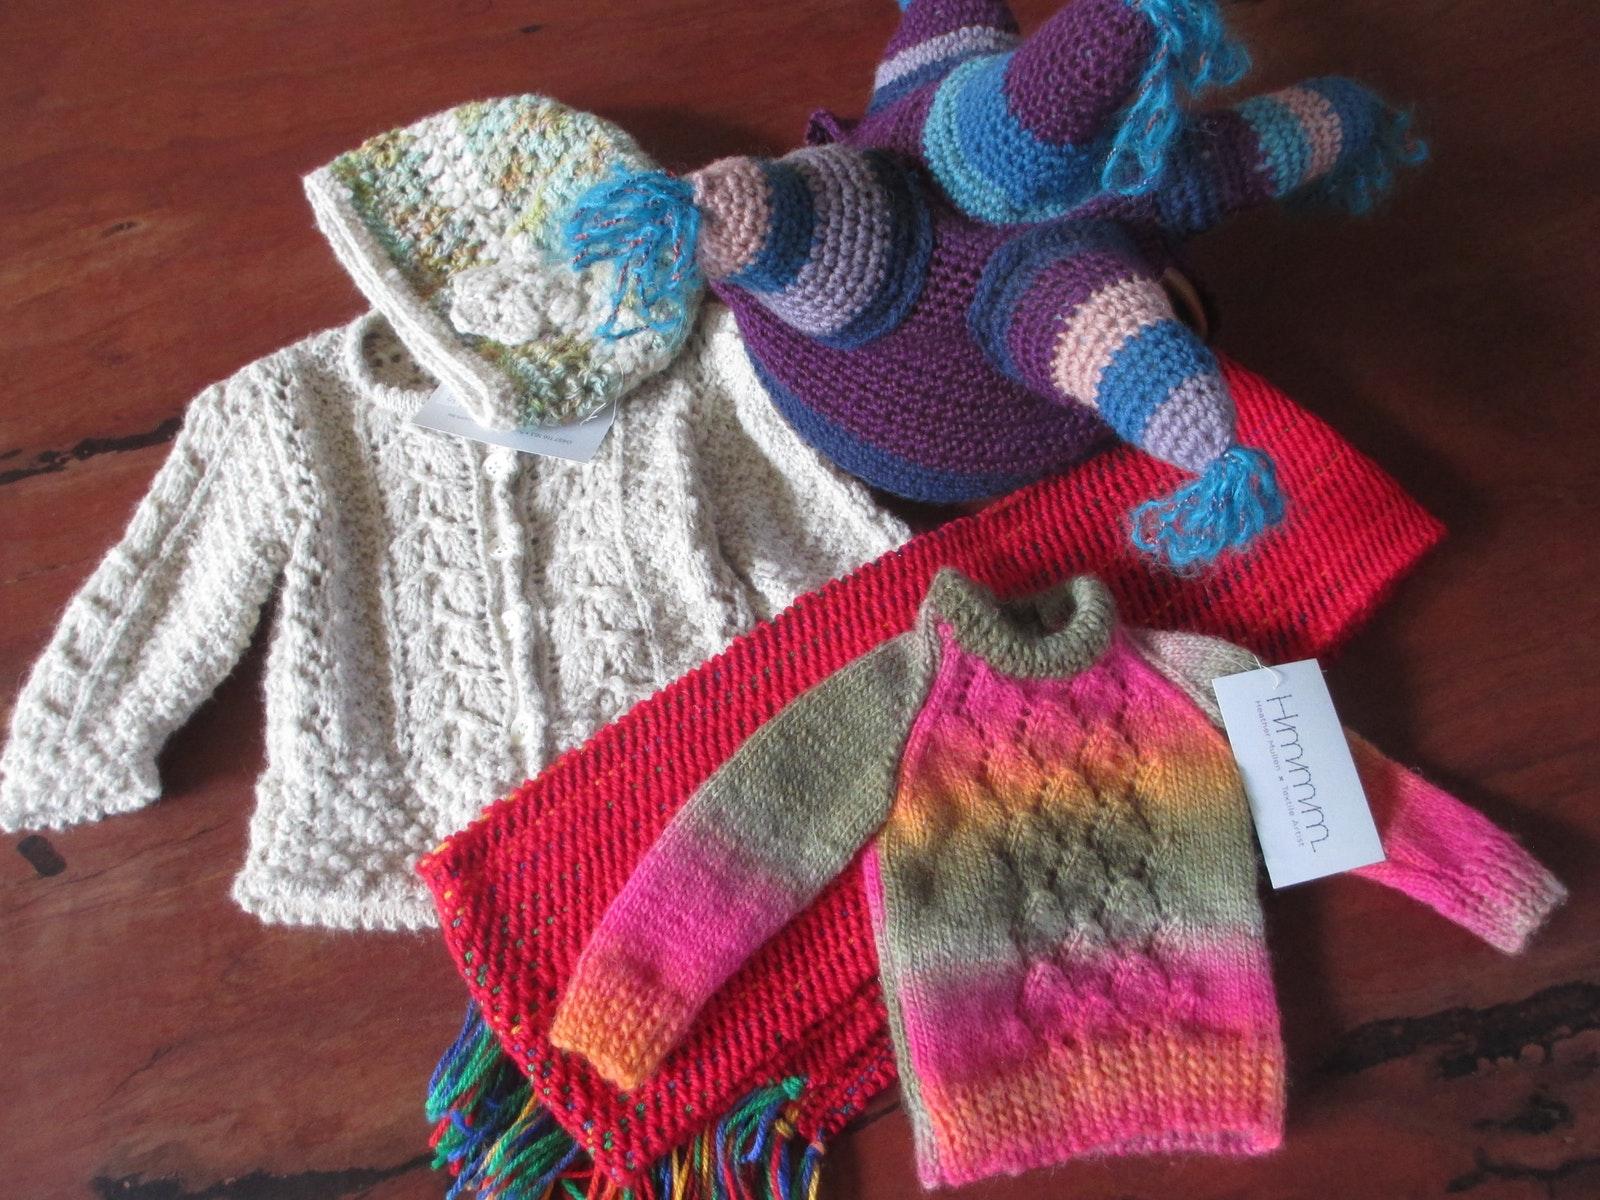 Handmade woollen garments